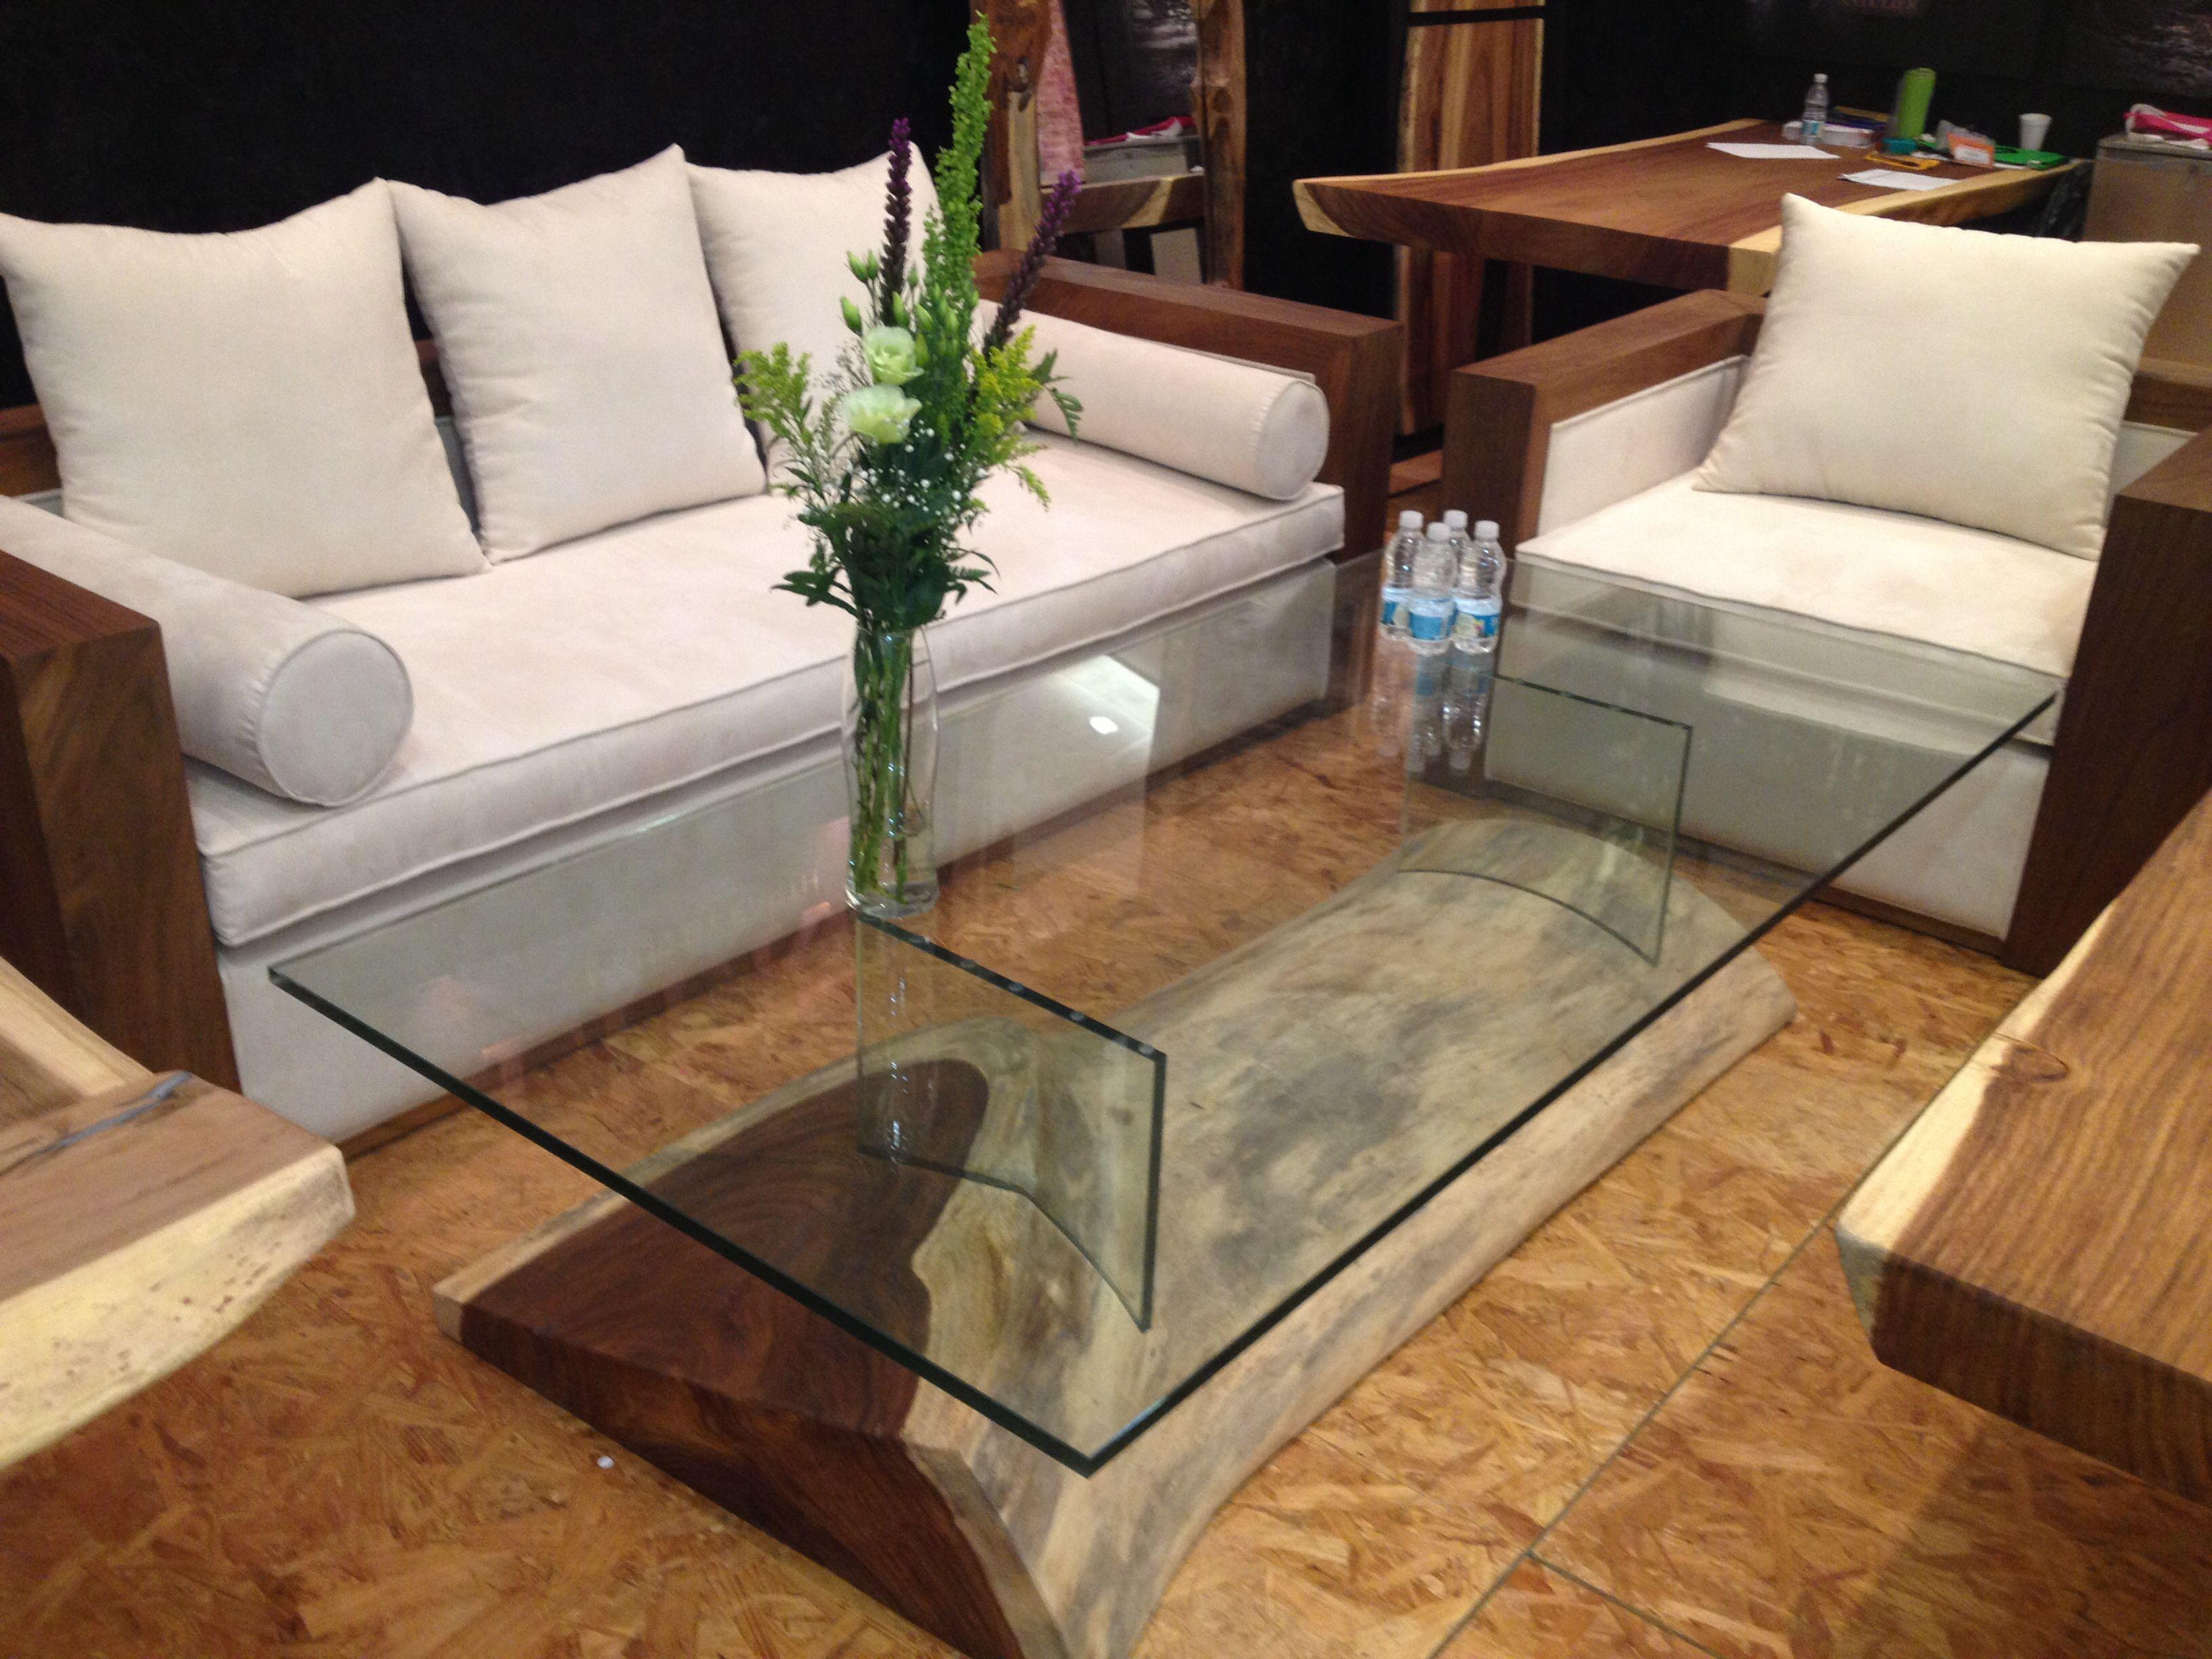 Parota Coffe Table